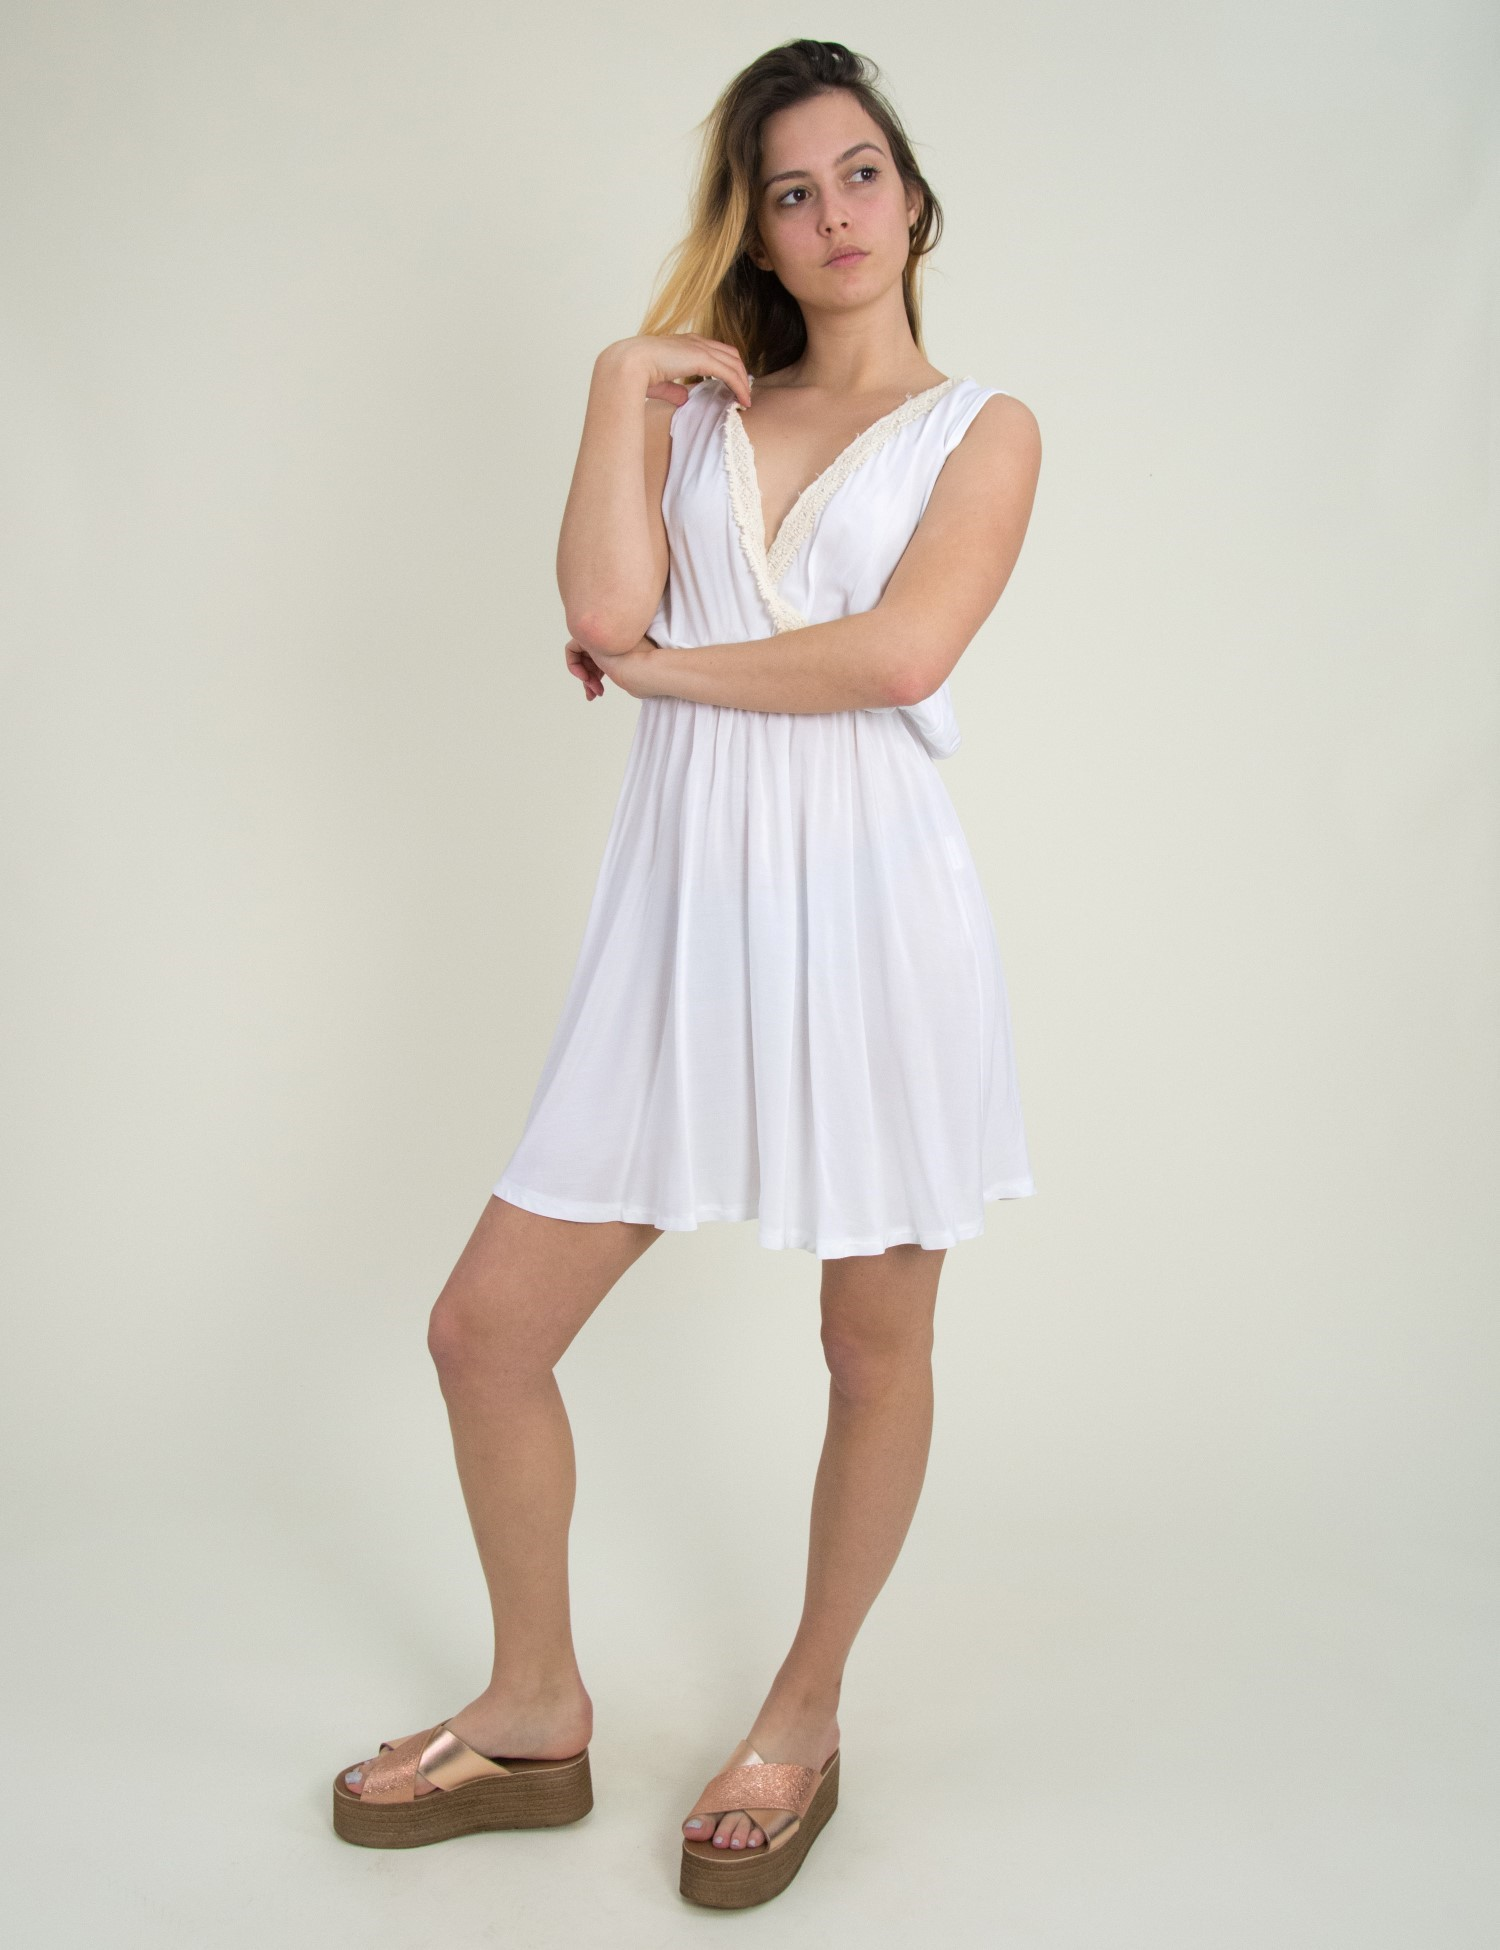 fed7a567a6c Γυναικεία > Ρούχα > Φορέματα > Καθημερινά / Maxi Φόρεμα με βαθύ ...